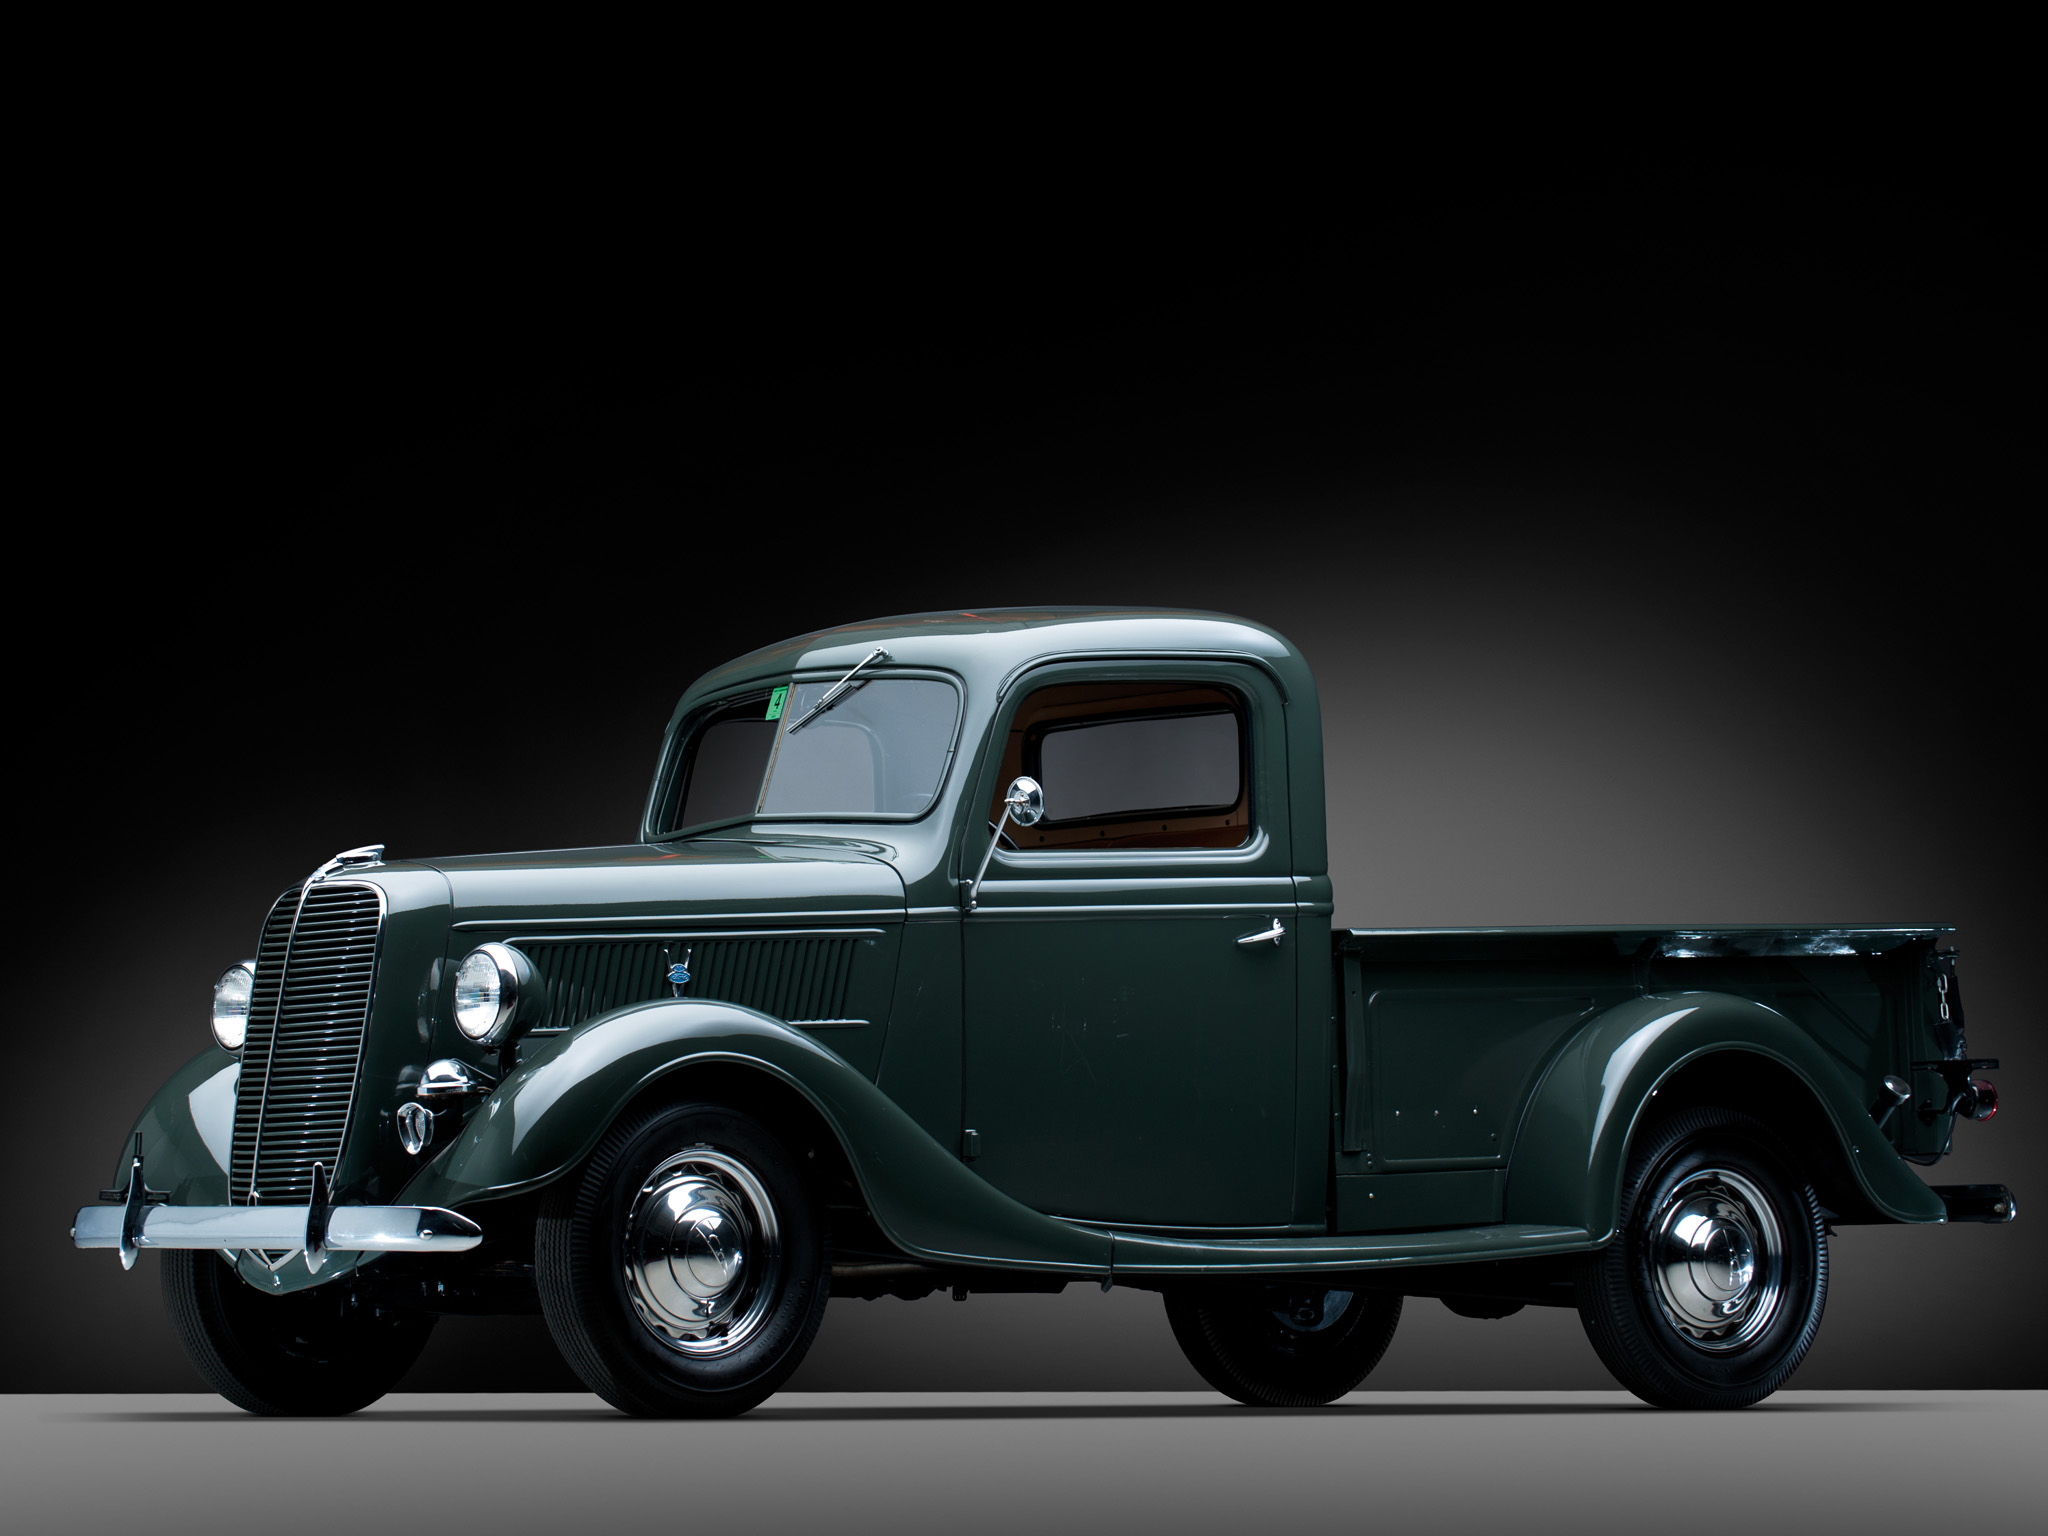 1937 Ford V8 Deluxe Pickup truck retro v 8 h wallpaper 2048x1536 2048x1536